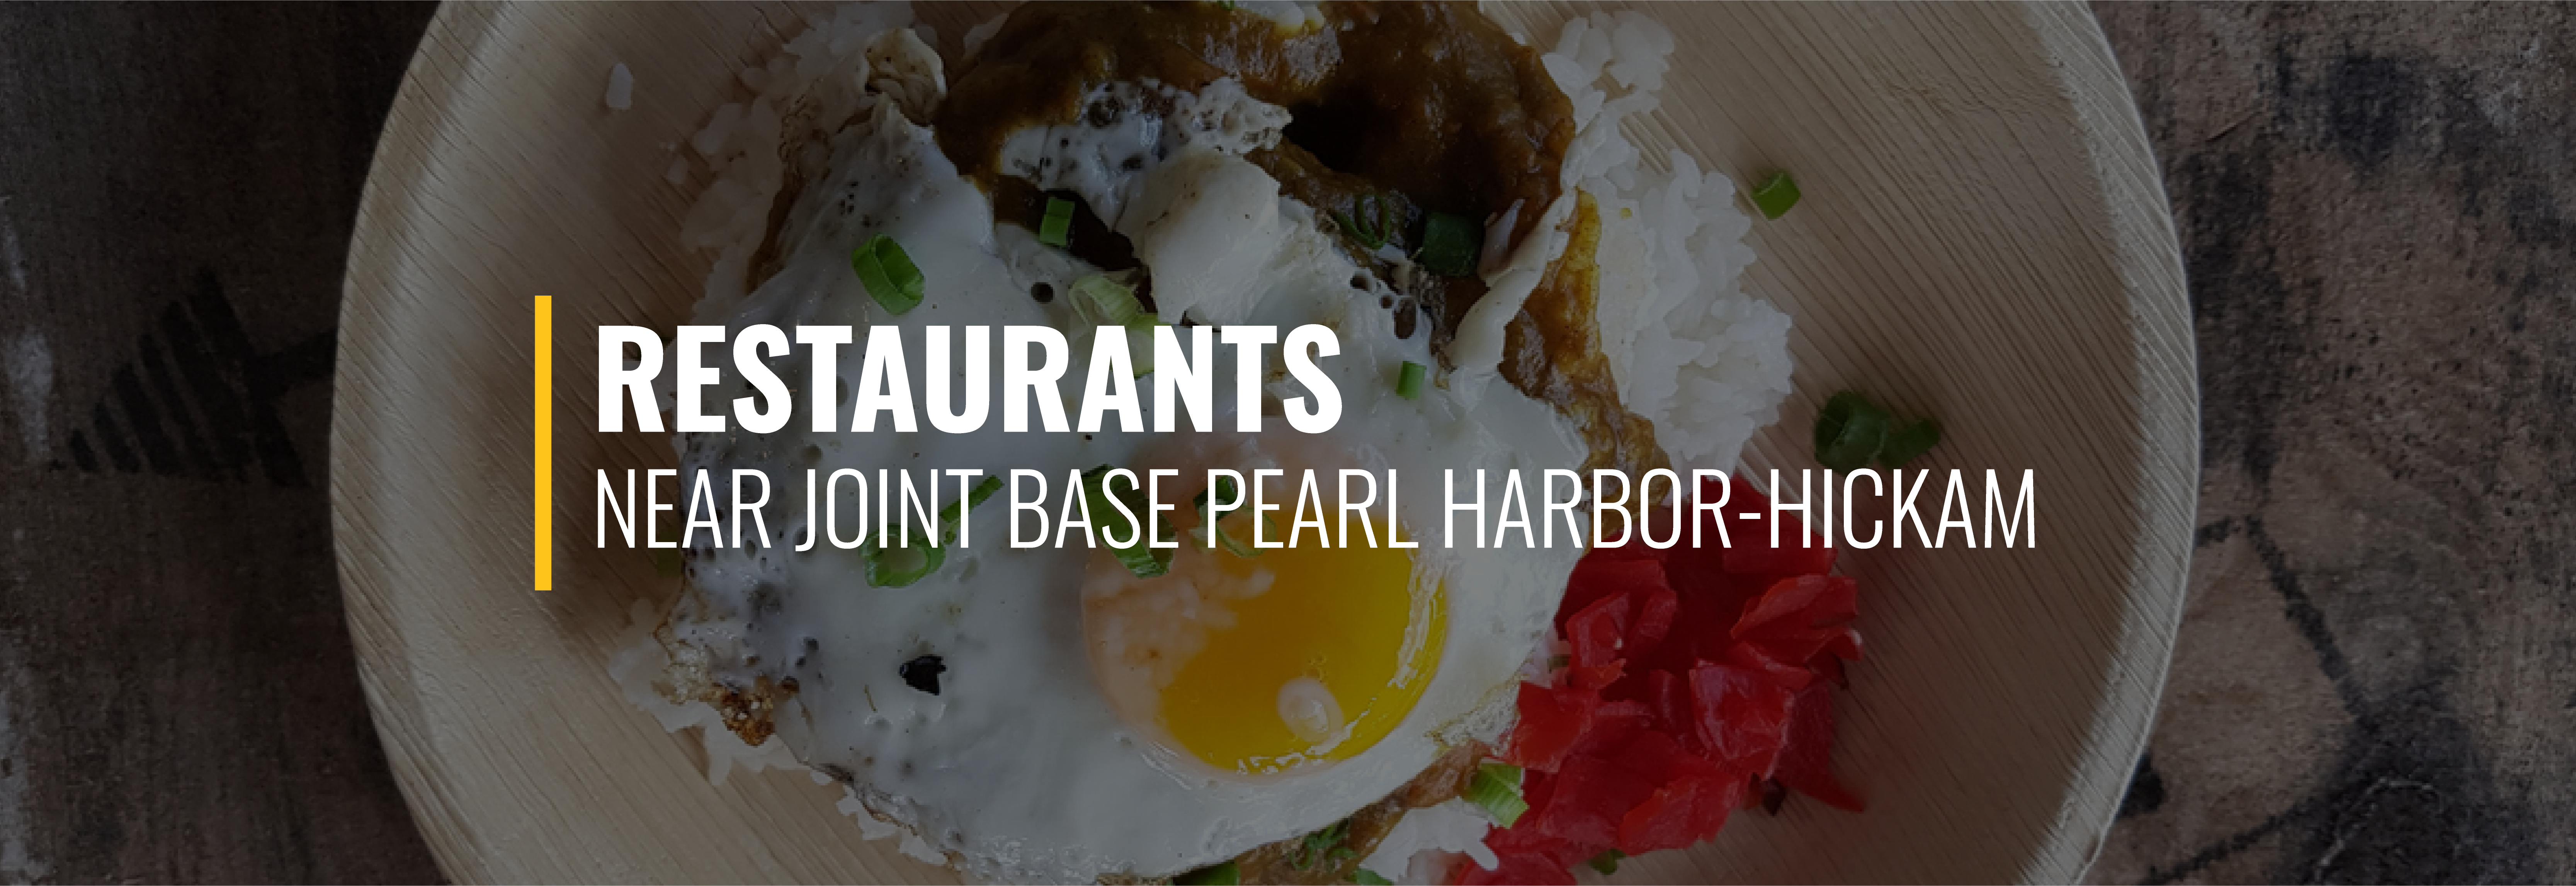 Restaurants Near Joint Base Pearl Harbor-Hickam